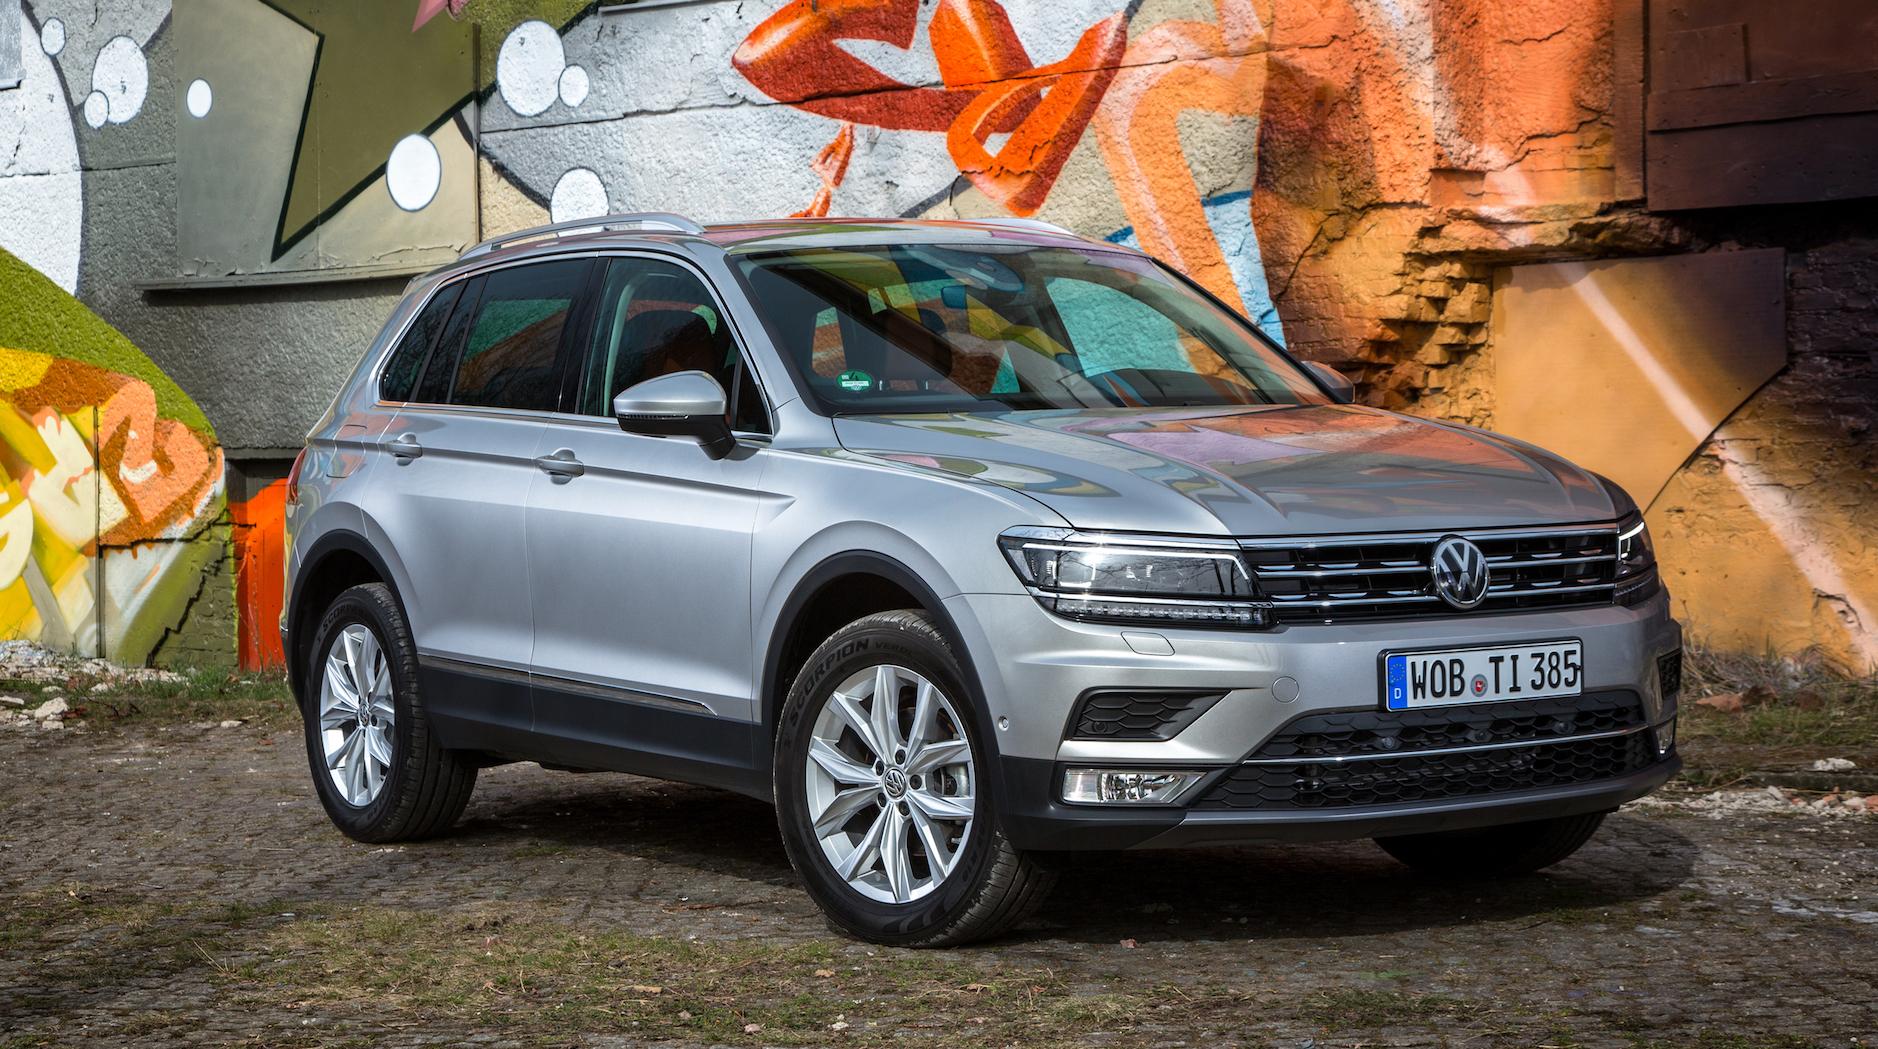 2016 Volkswagen Tiguan Review | CarAdvice